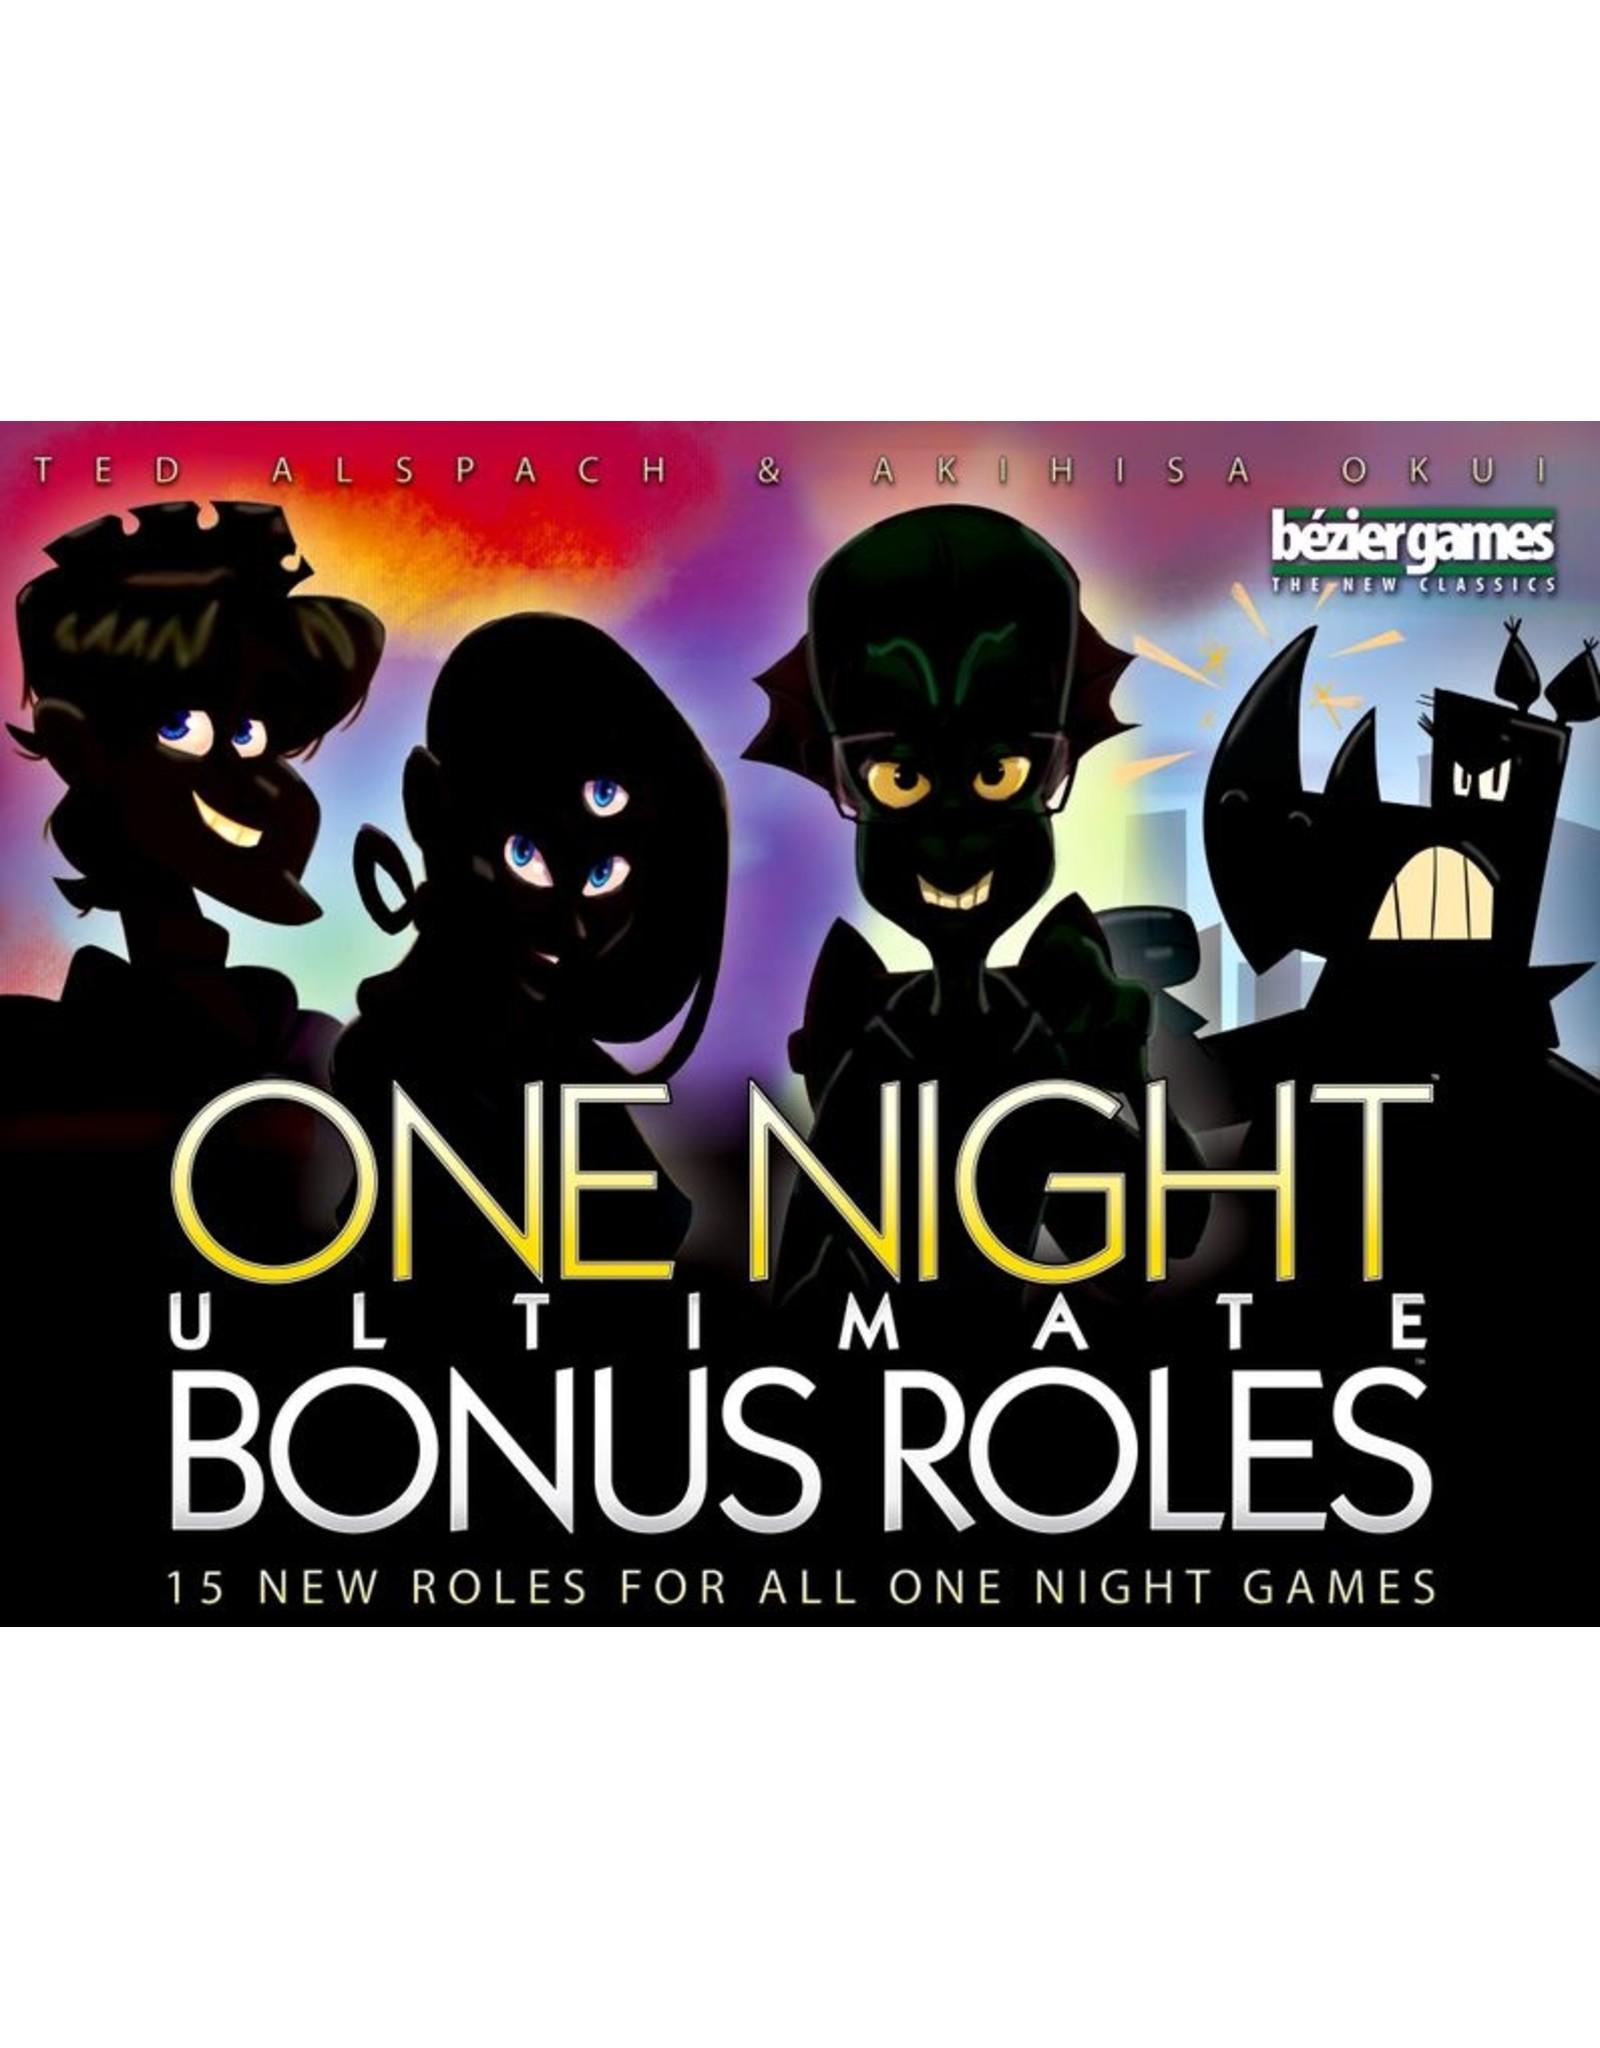 BEZIER GAMES ONE NIGHT BONUS ROLES